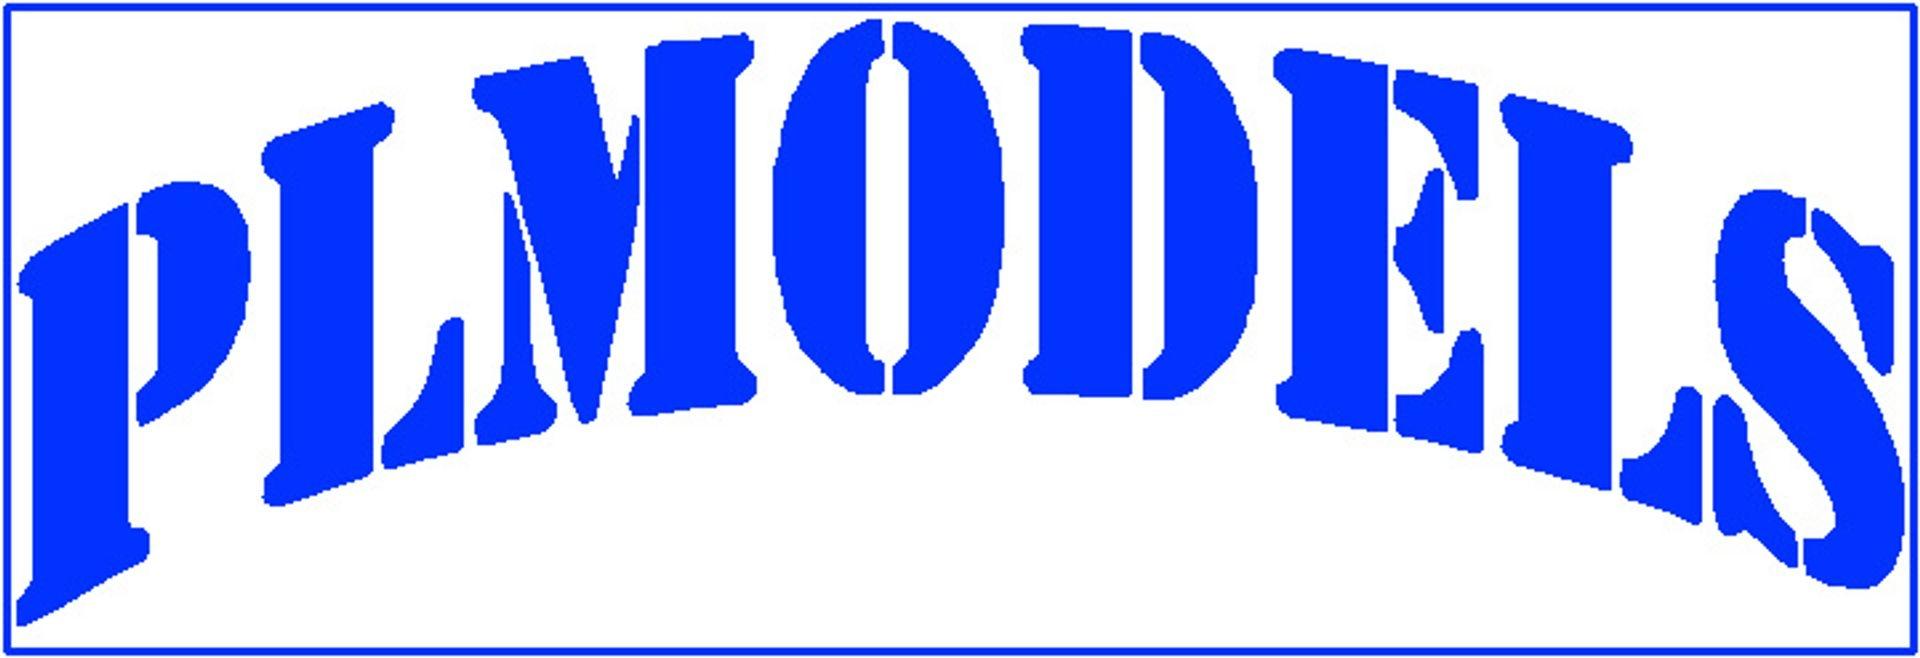 PLModels.com Title & Header